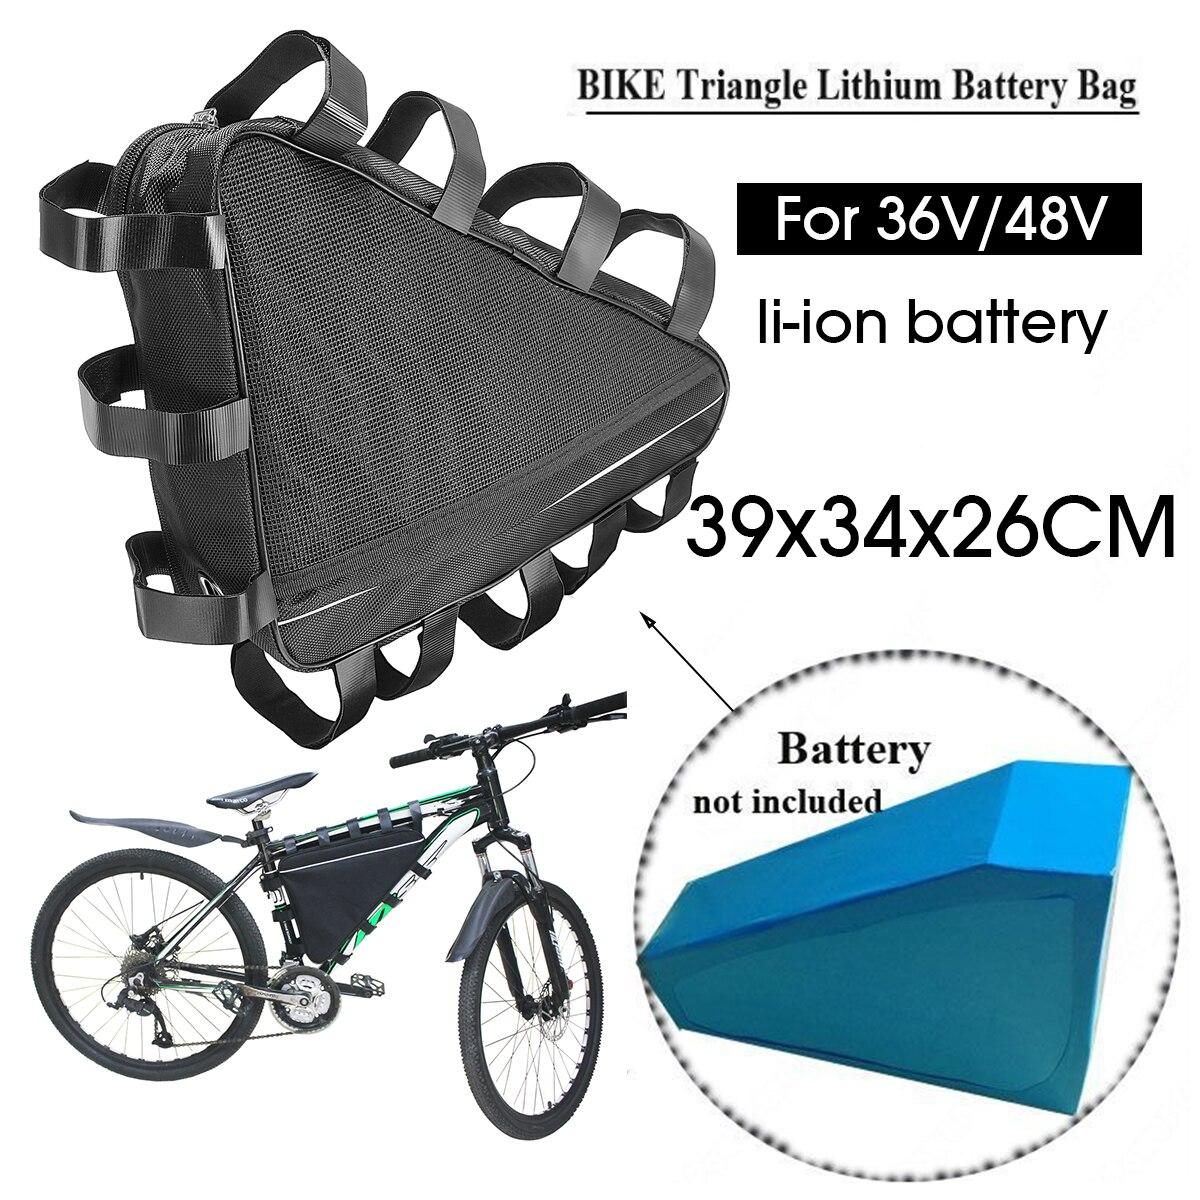 Mountain Bike Triangle Li-ion Battery Storage Bag Electric Bicycle Triangle Bag